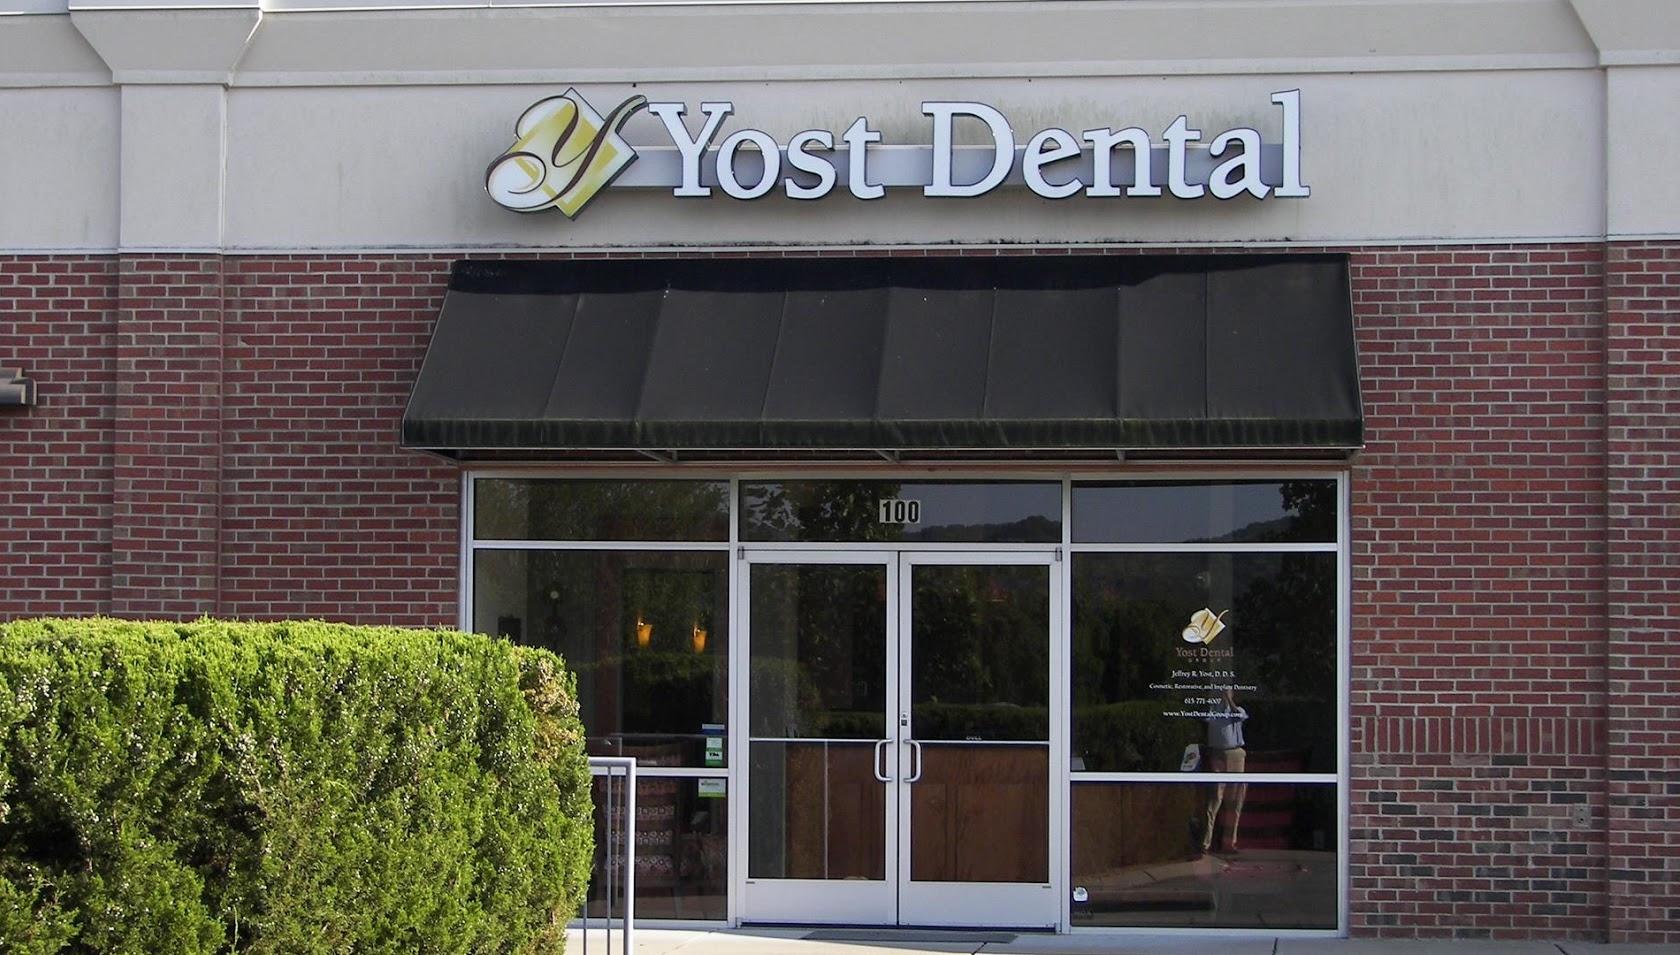 Yost Dental Group 100 Cool Springs Blvd 100 Franklin, TN 37067 (615) 771-4007